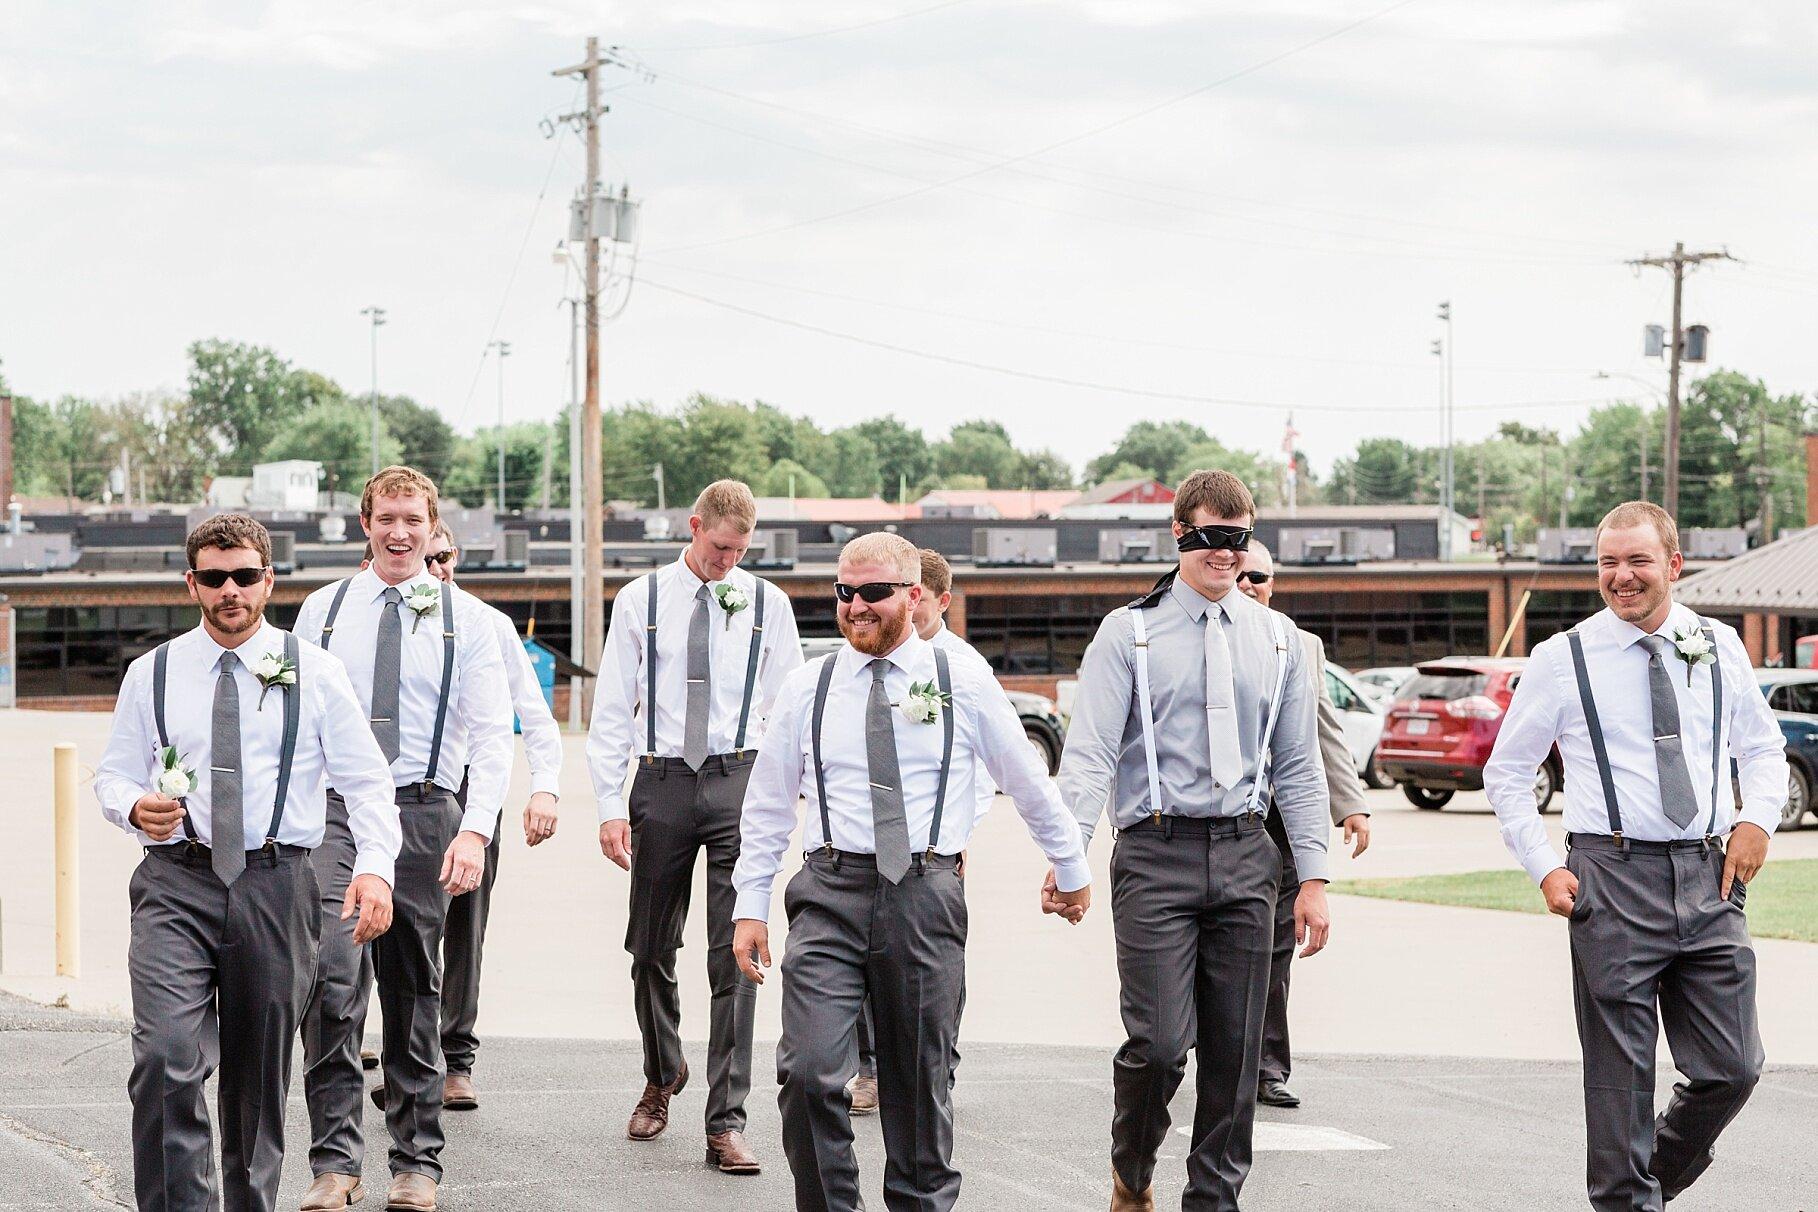 Earth-Toned Wedding by KKP Associate Wedding Photographer and Kelsi Kliethermes Photography Best Columbia Missouri Wedding Photographer_0020.jpg